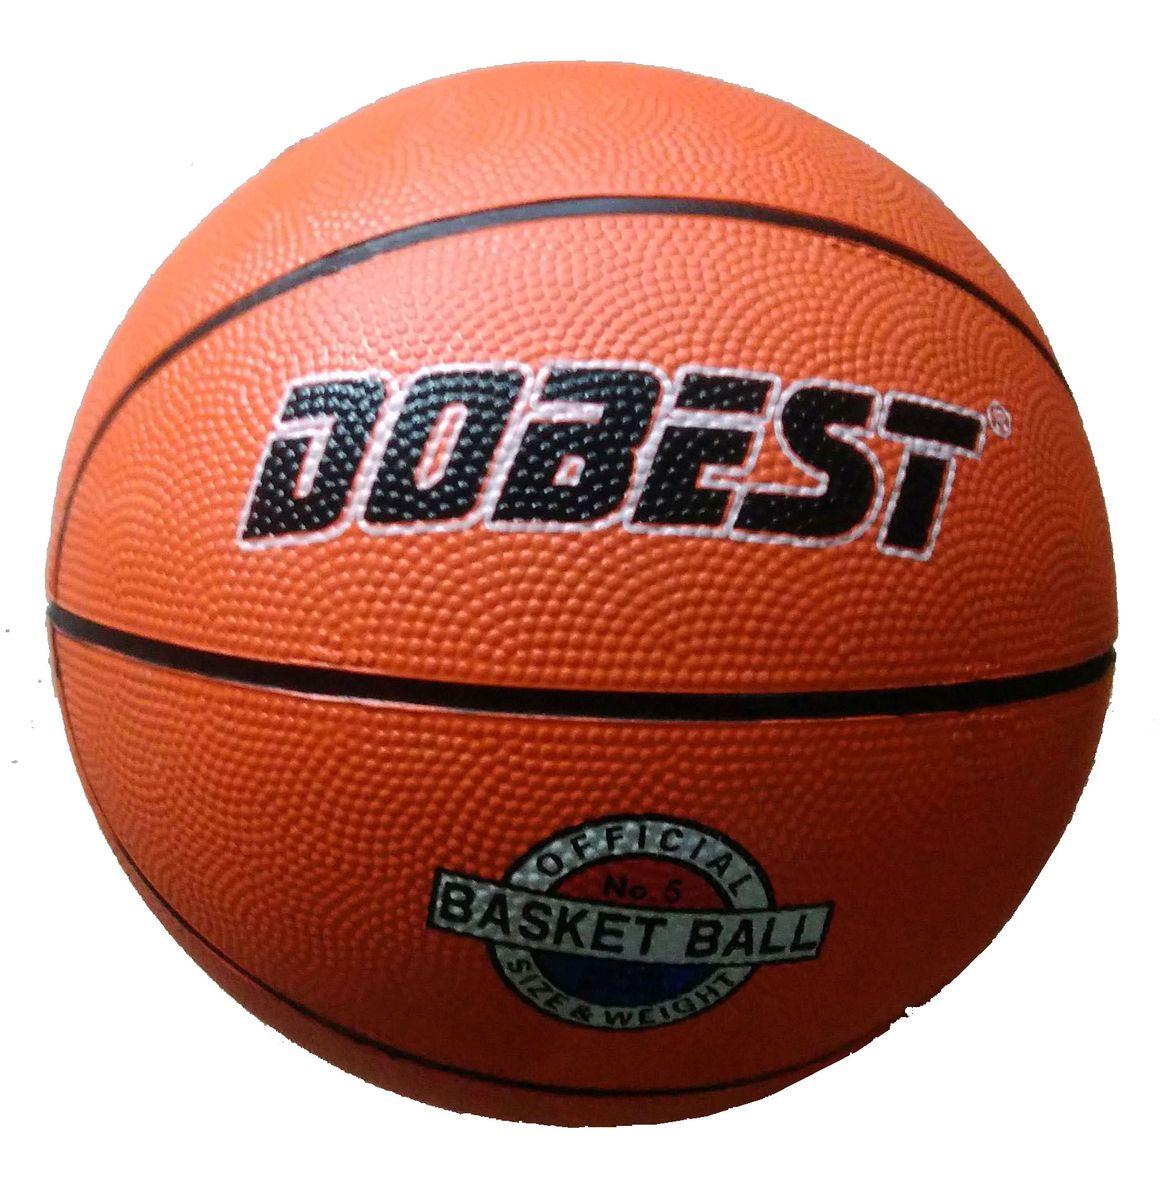 Мяч баскетбольный Dobest RB5, цвет: оранжевый. Размер 5 мяч для н т dobest ba 01 3шт уп